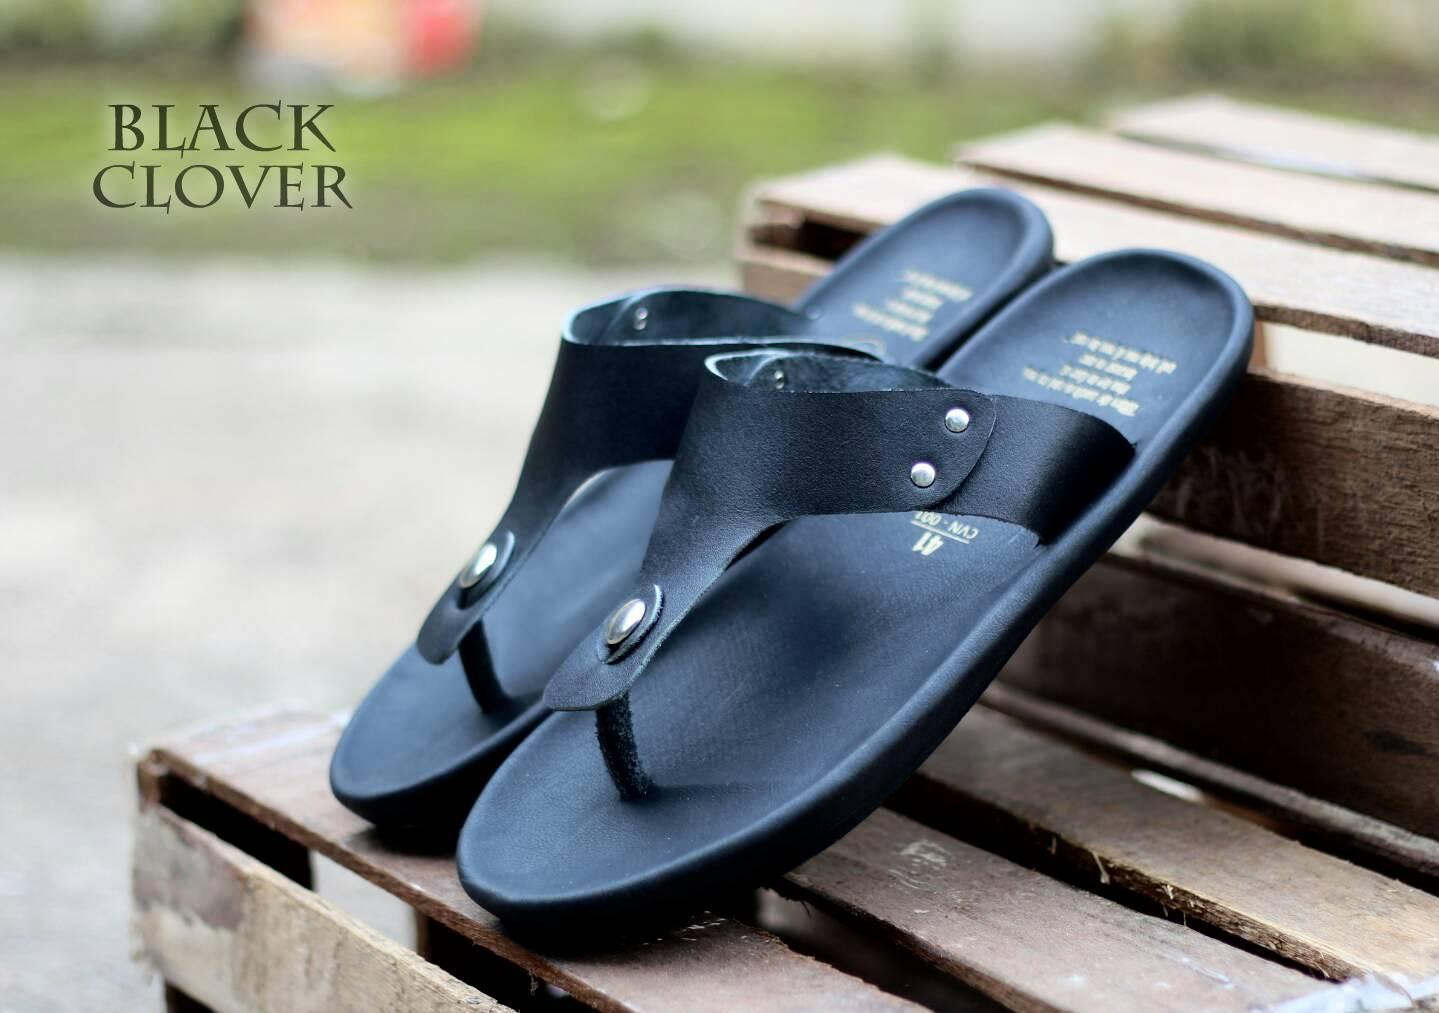 sandal pria kulit asli termurah di bandung sendal distro terlaris cevany goodness volar joey kickers adidas nike casual formal promo lazda ramadhan sale